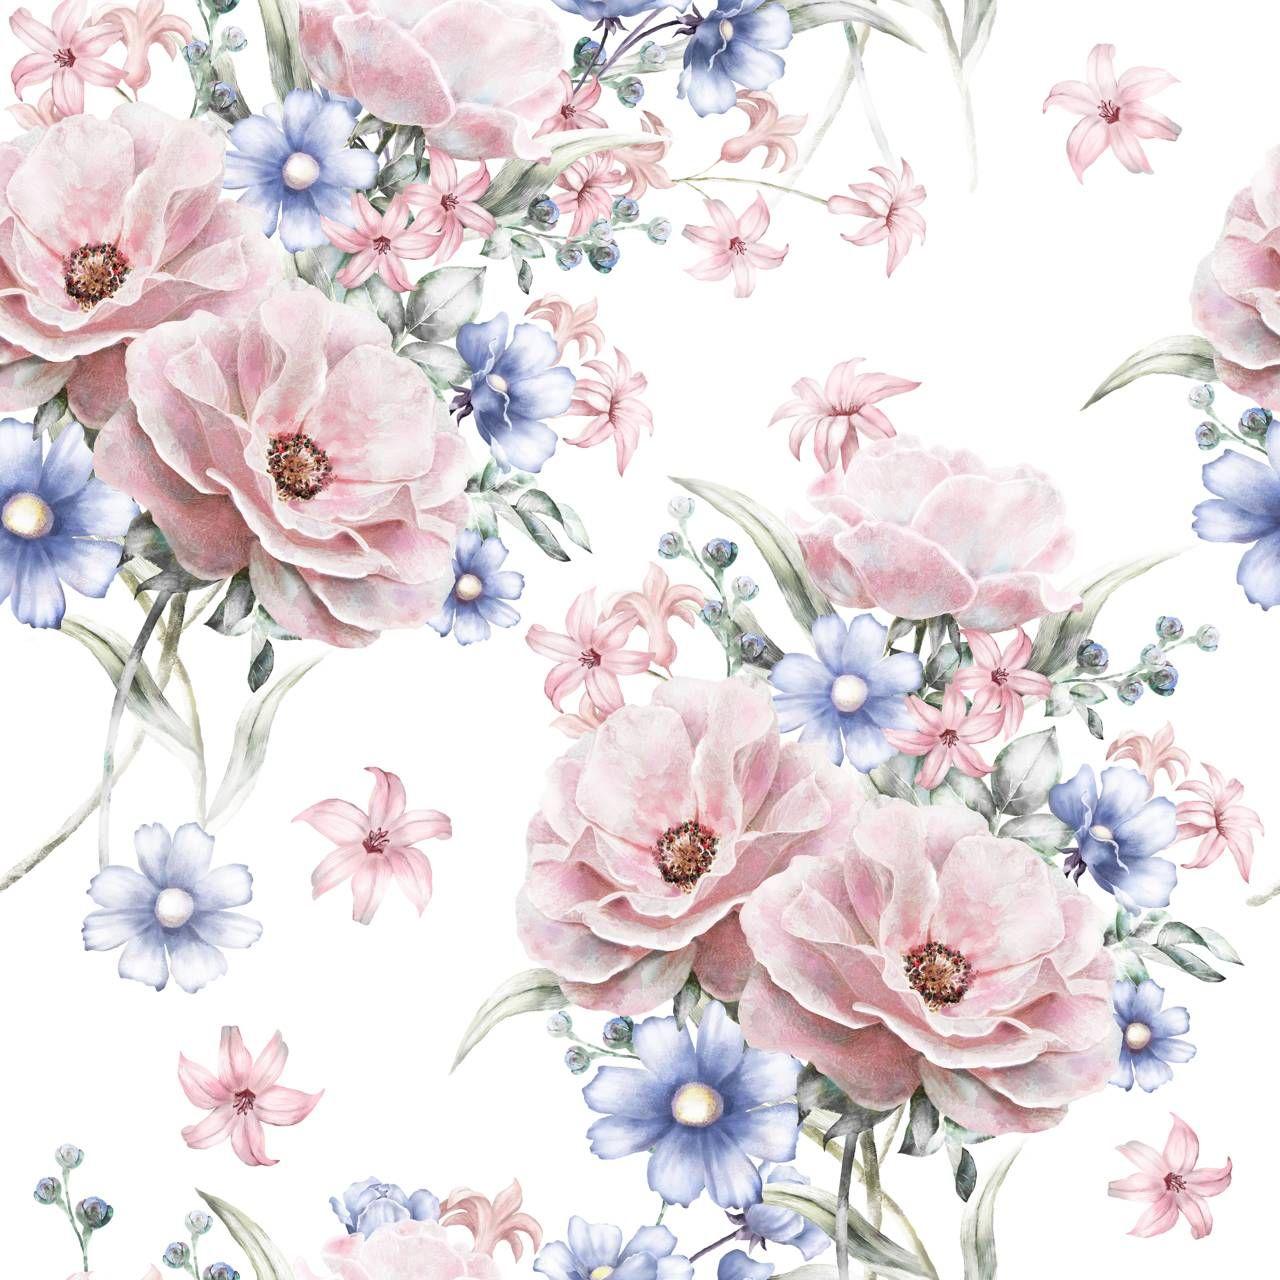 Download vintage flowers wallpaper by iridak1 b7 free